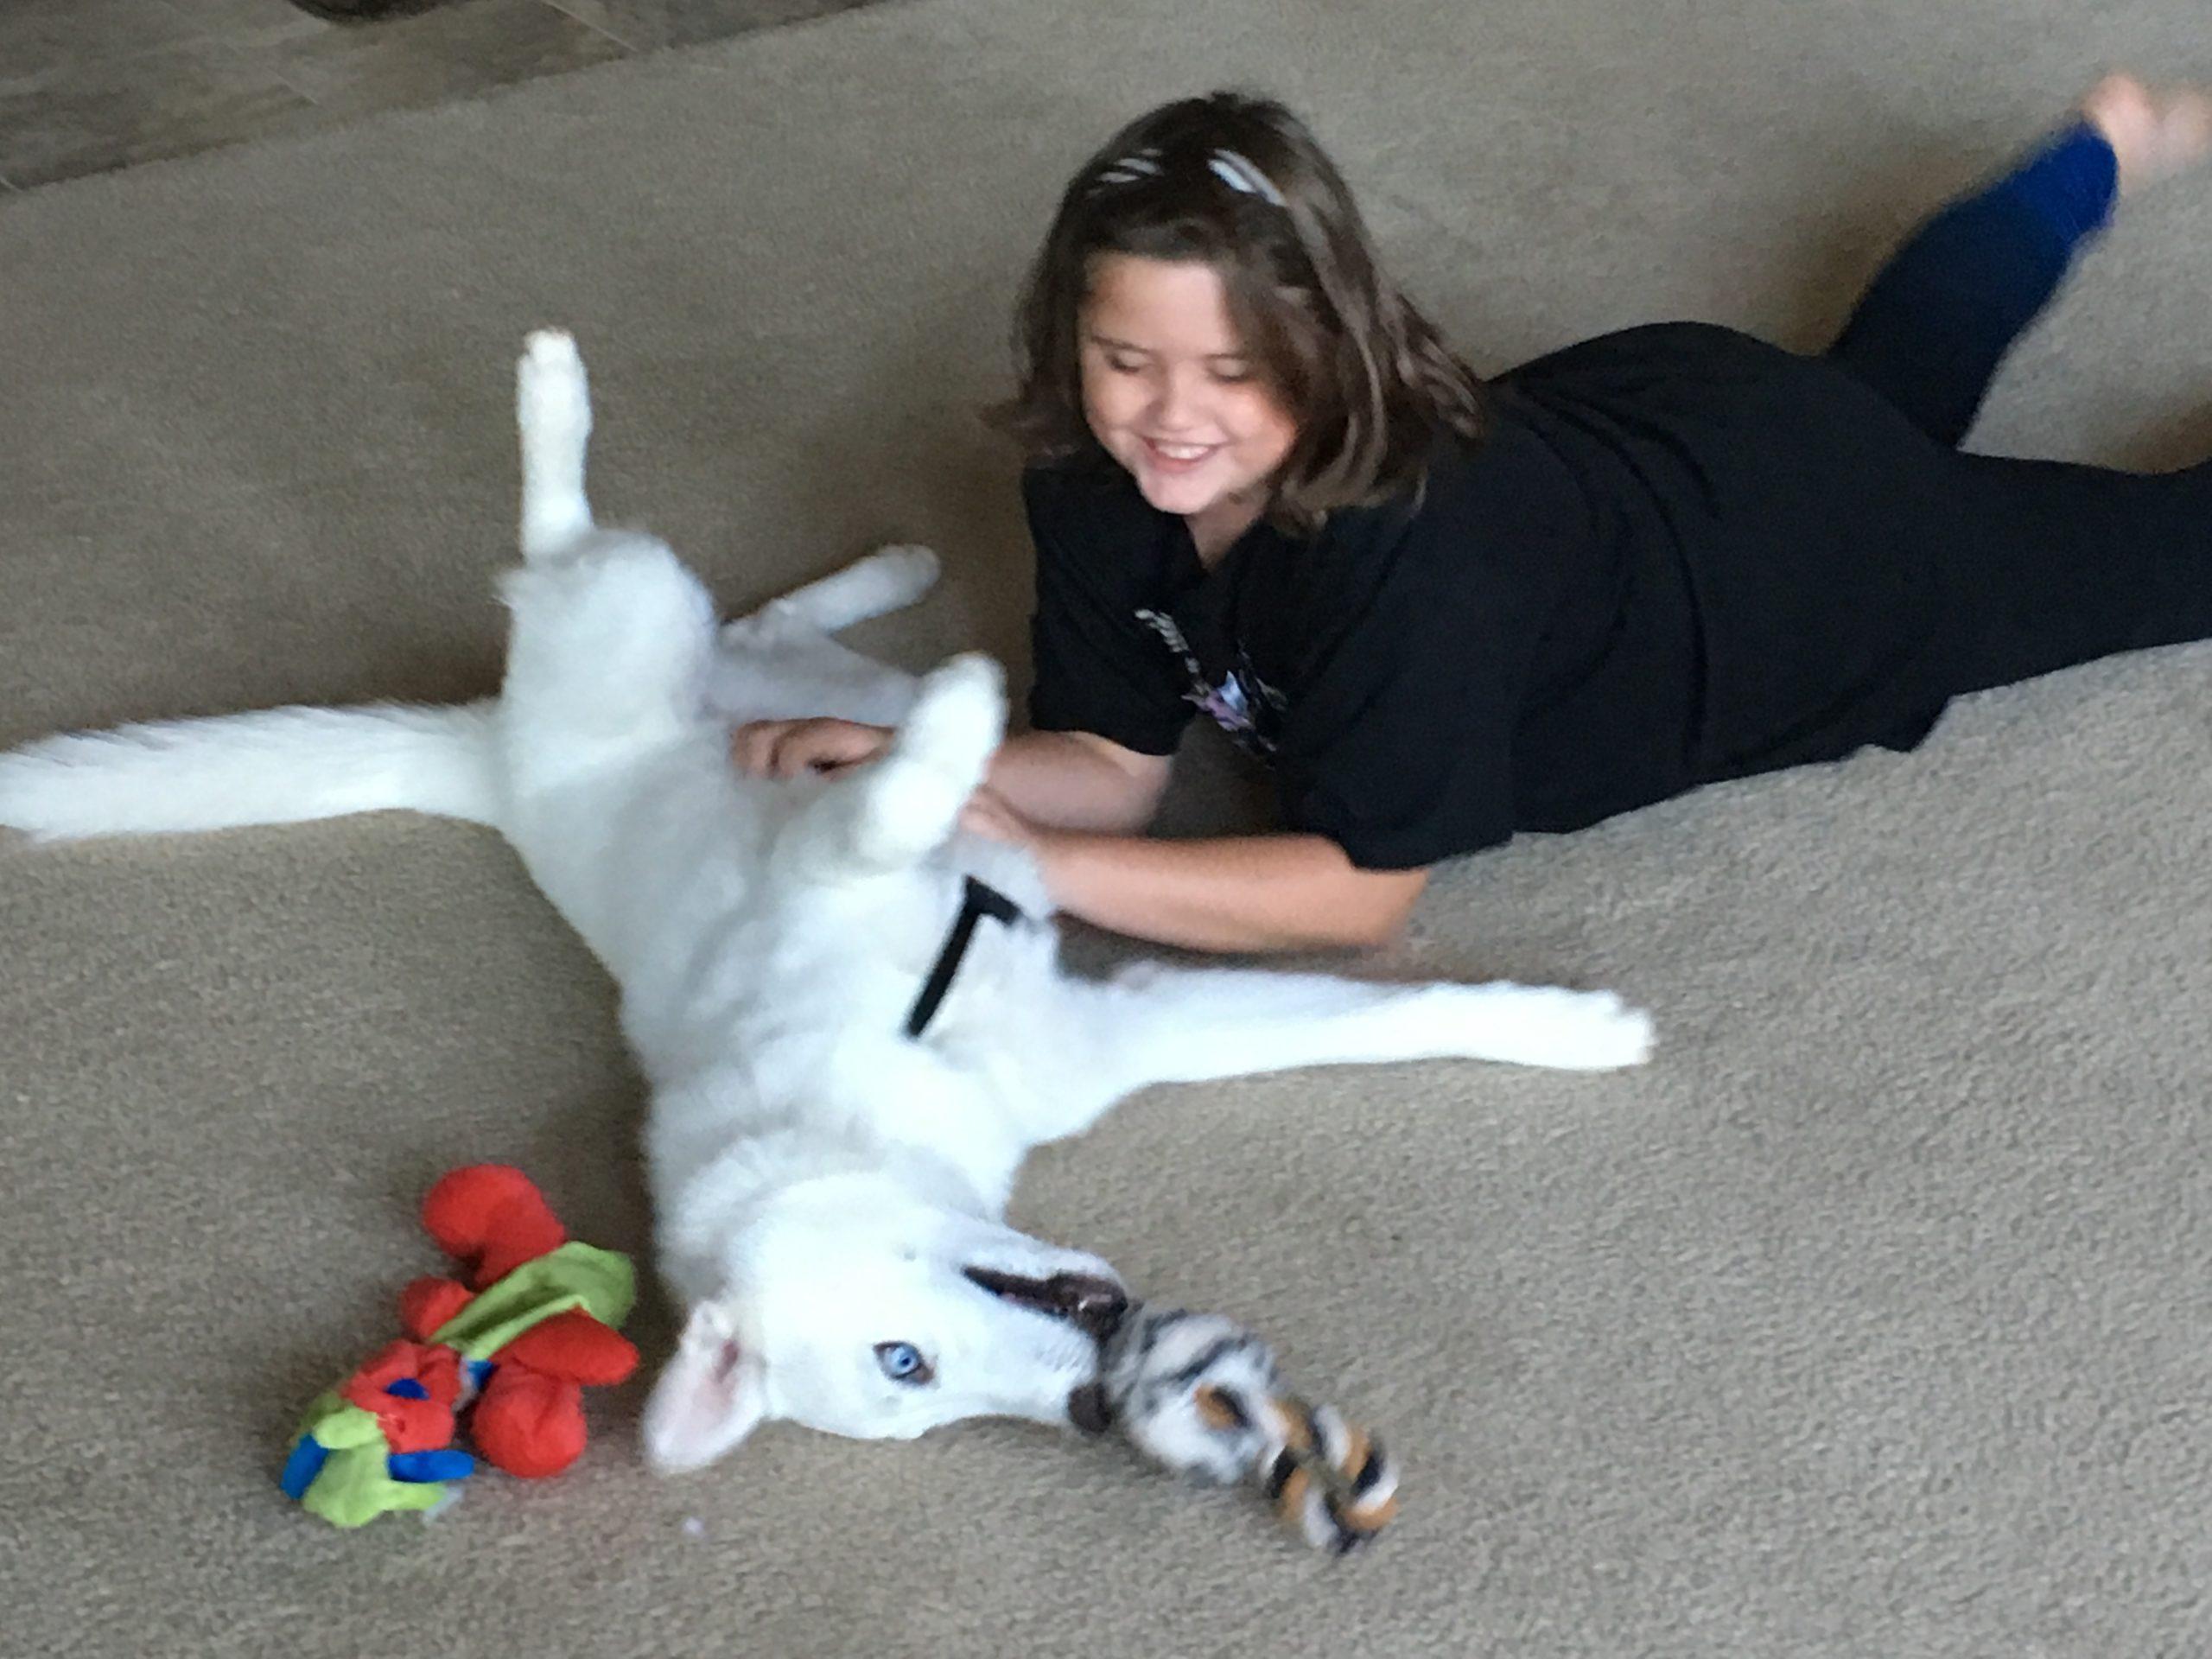 Family dog Trainer